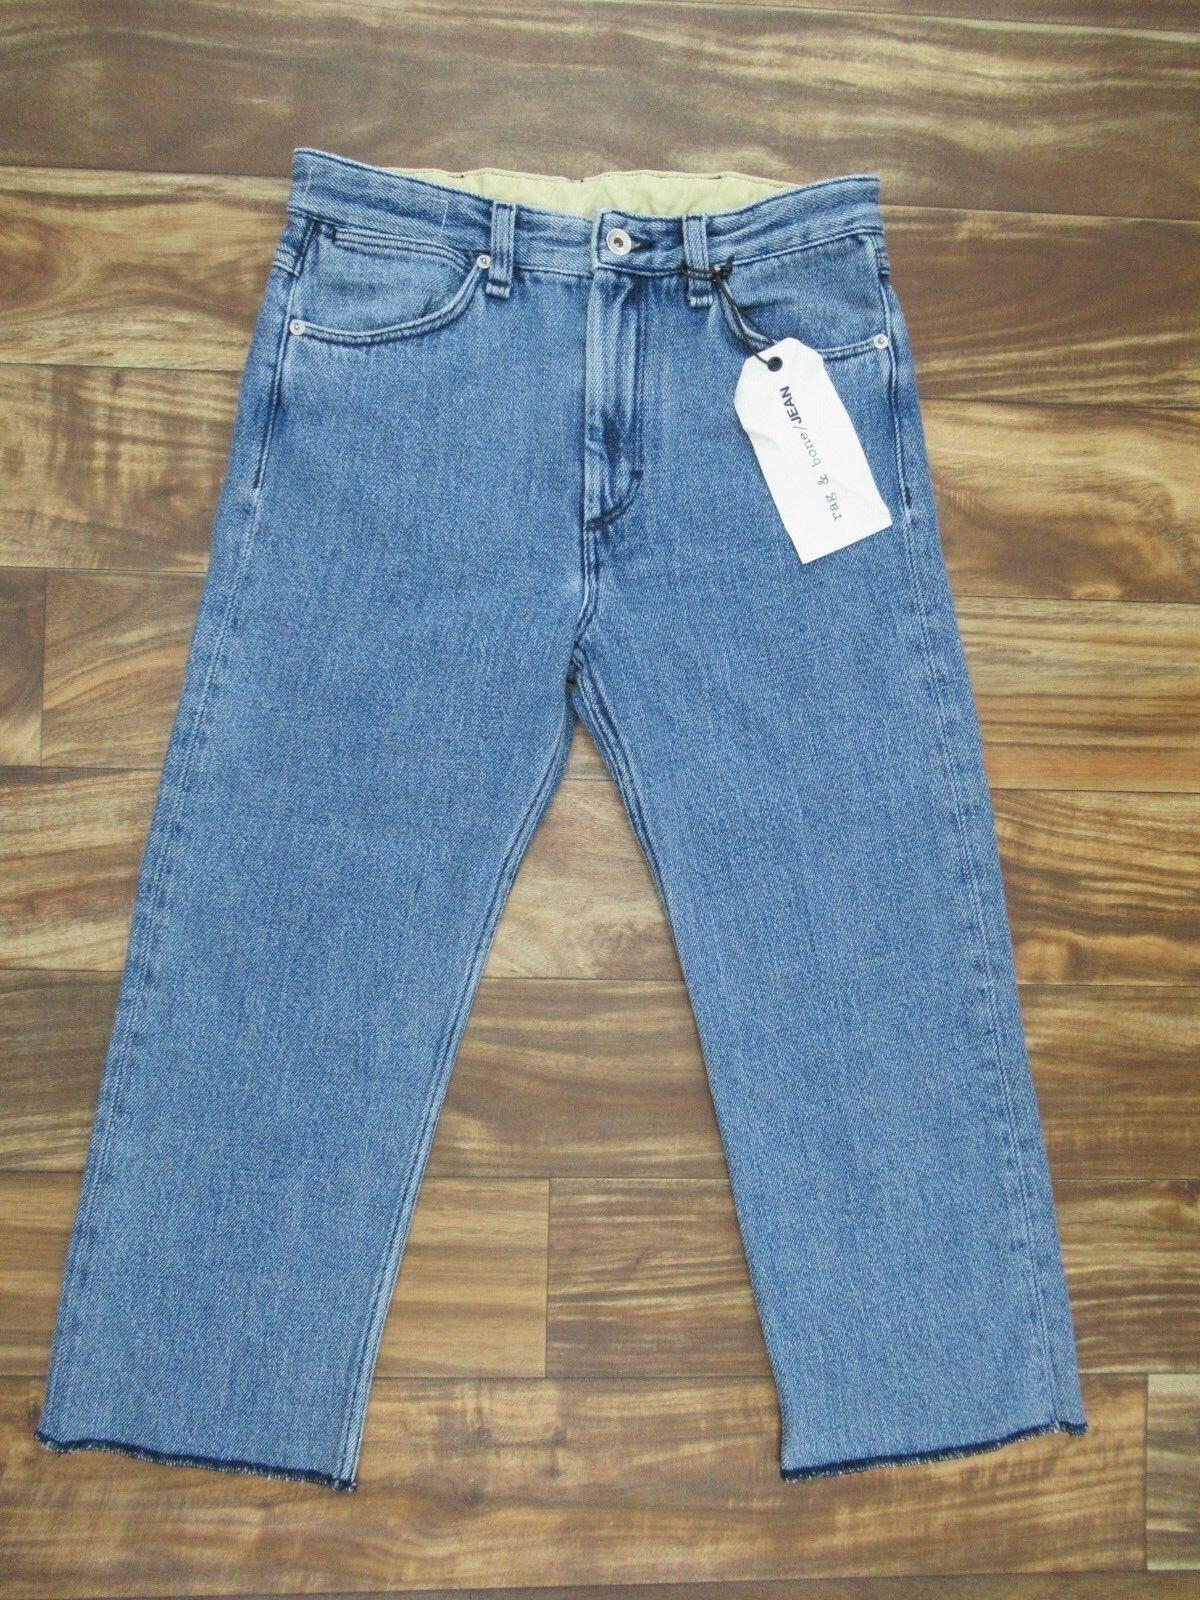 Neu  Rag & Bone  Jeans Dick Gestrickt Abgeschnitten Capri Hohe Größe Jeans